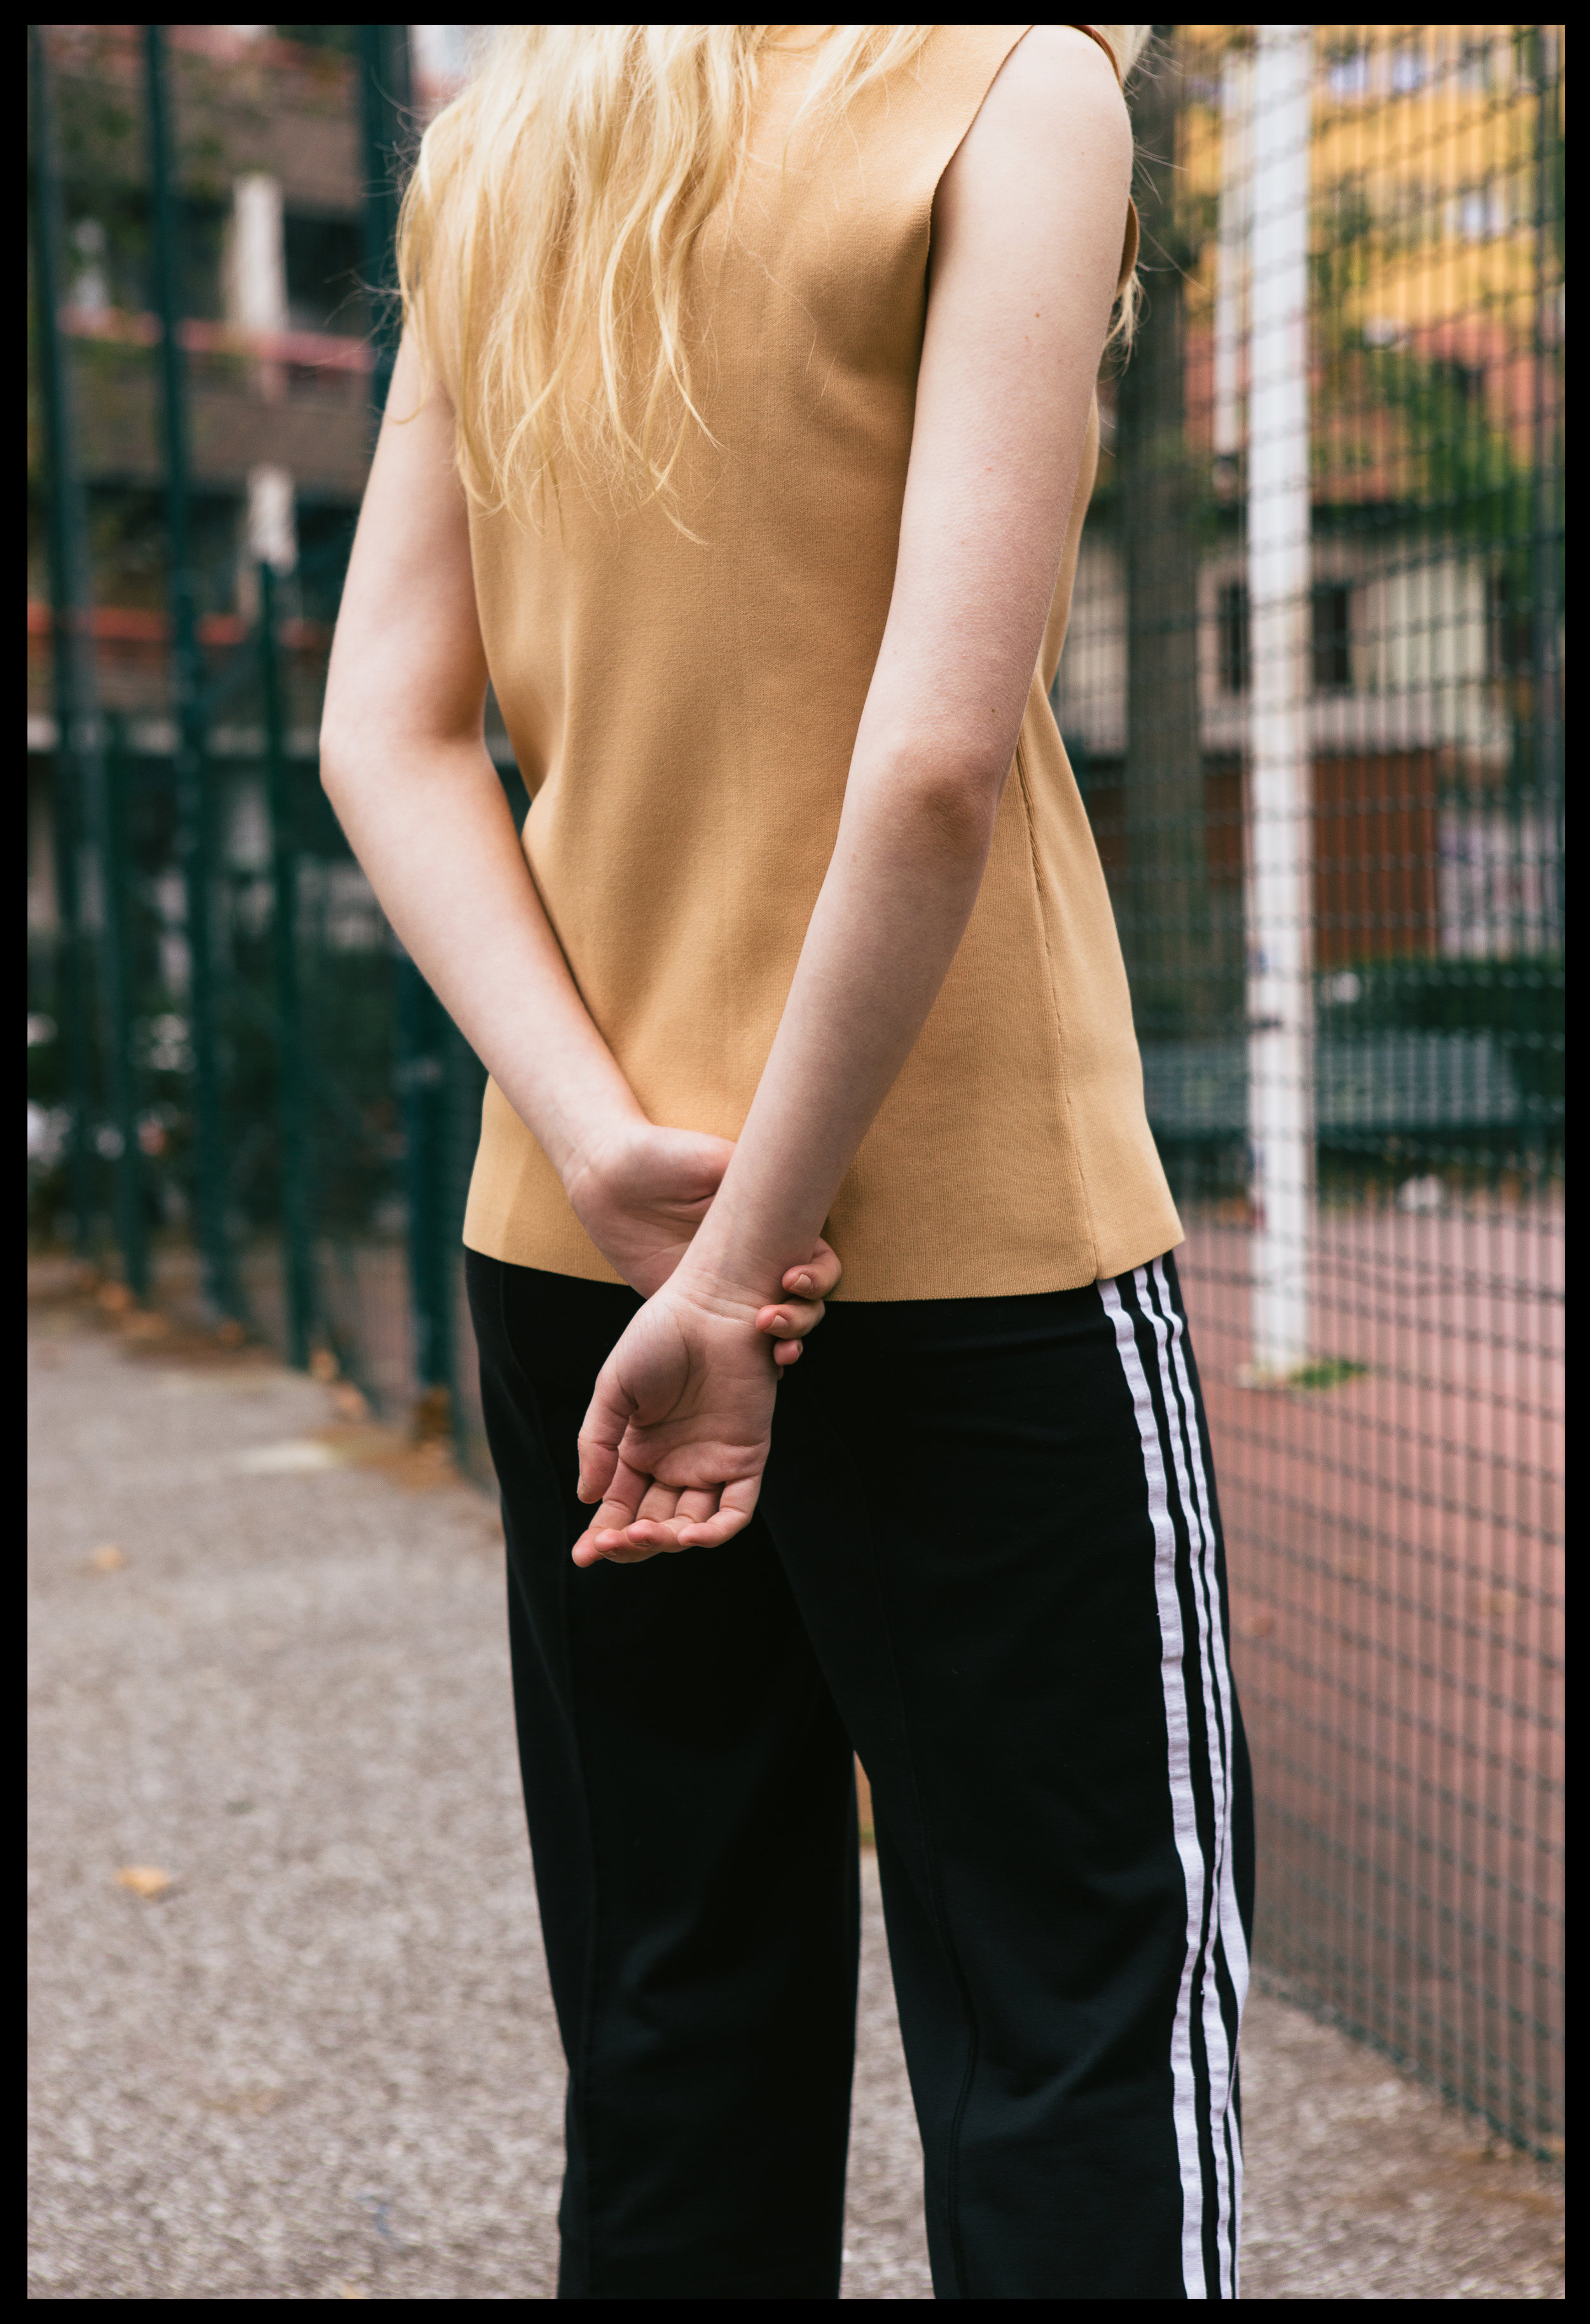 top VINTAGE,trousers  ADIDAS  VINTAGE, boots  Elena lachi